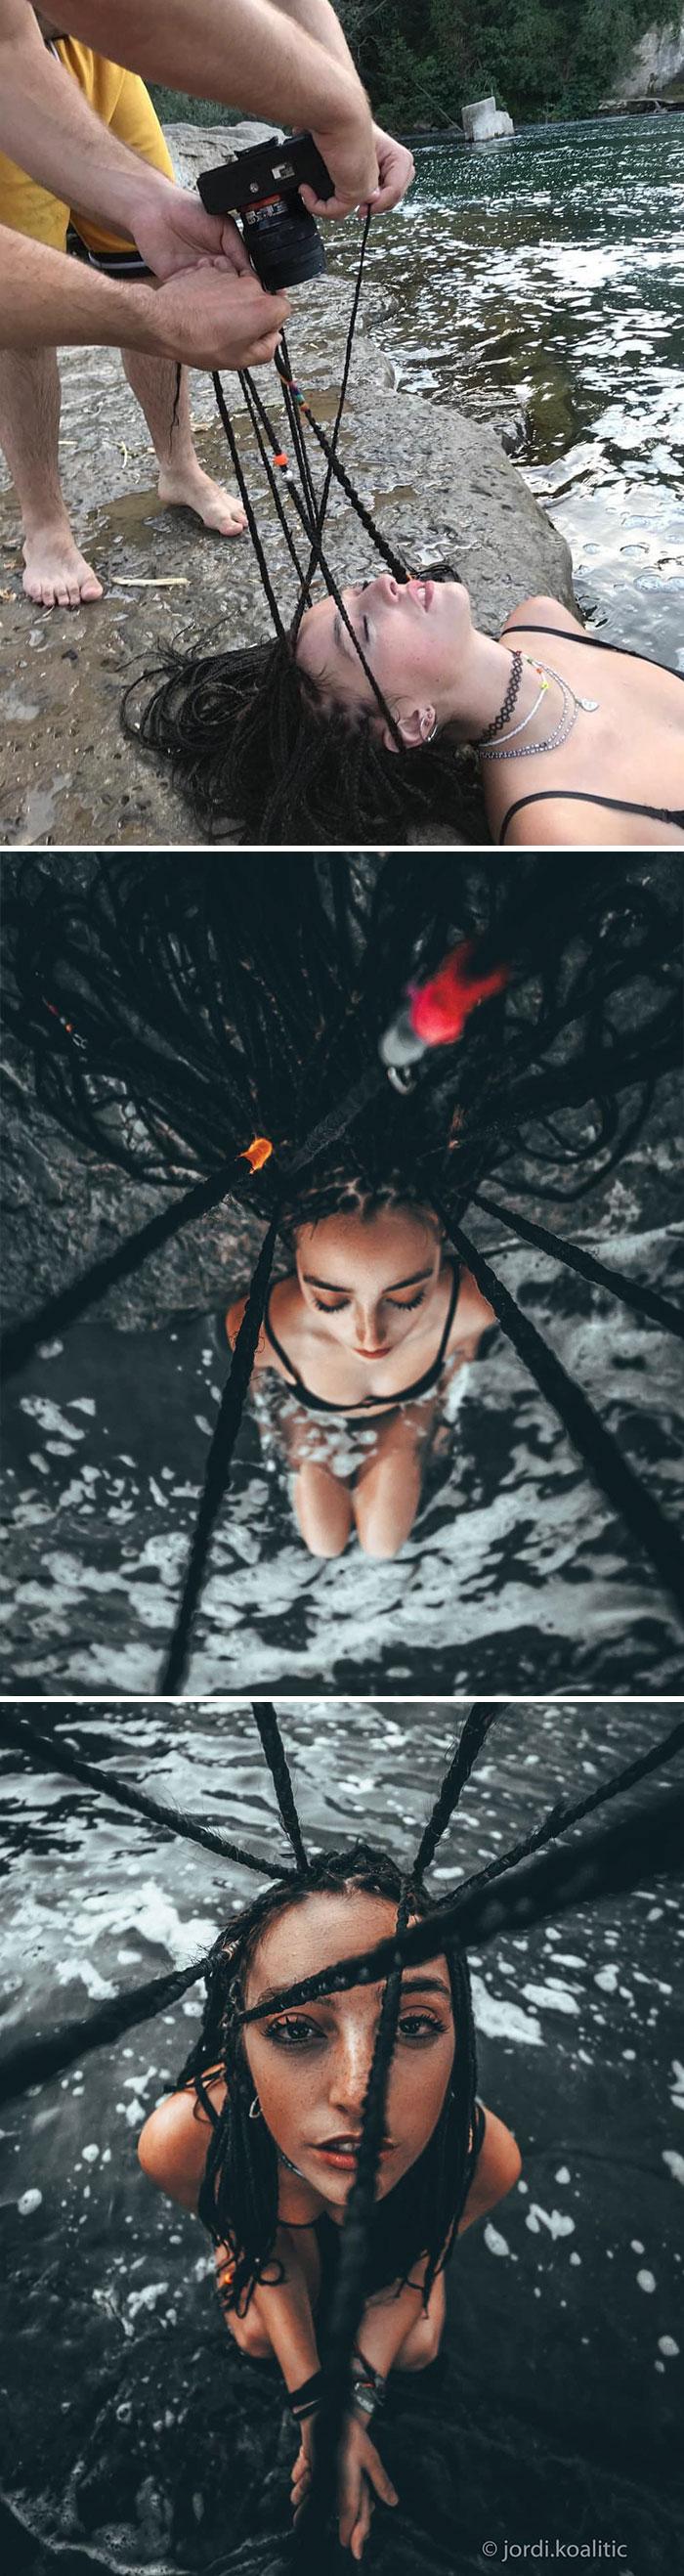 Creative-Photography-Tips-Tricks-Jordi-Puig